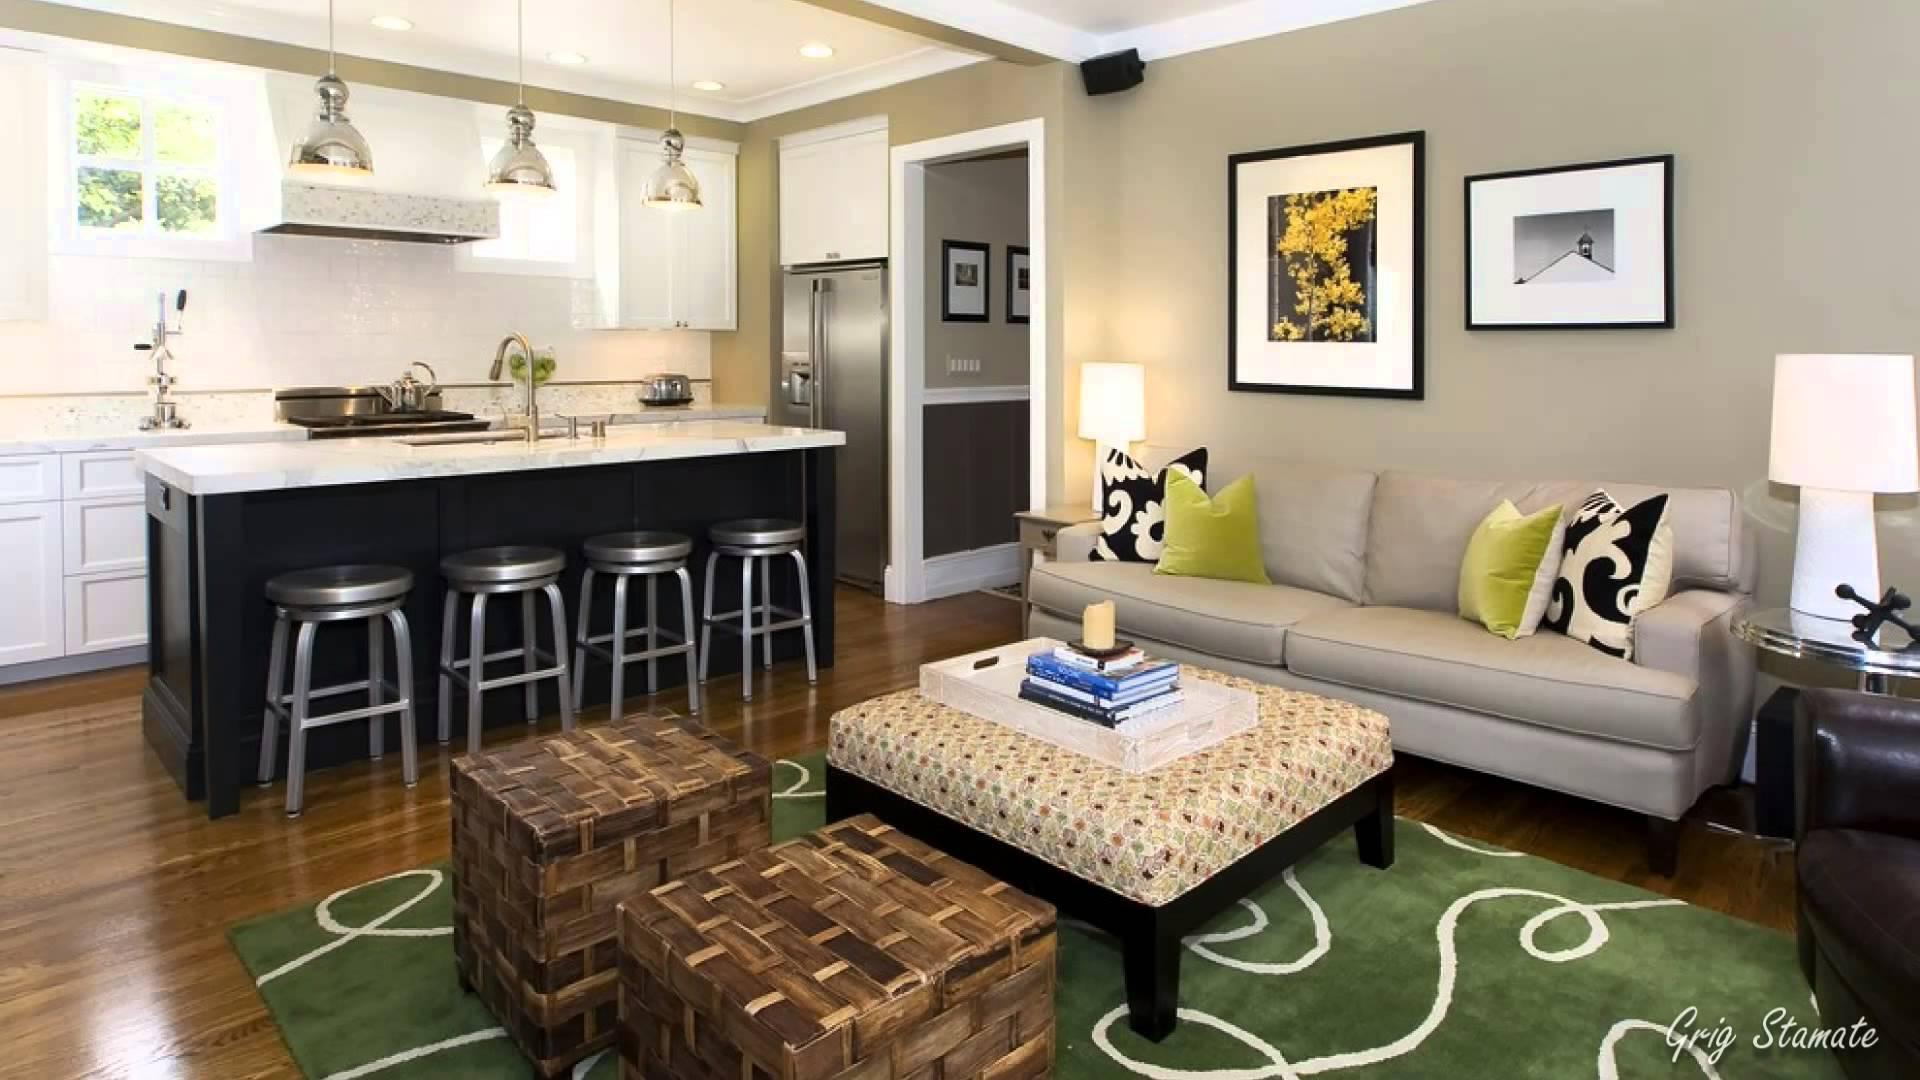 fabulous small basement apartment decorating ideas youtube and small apartment VBRNFDK